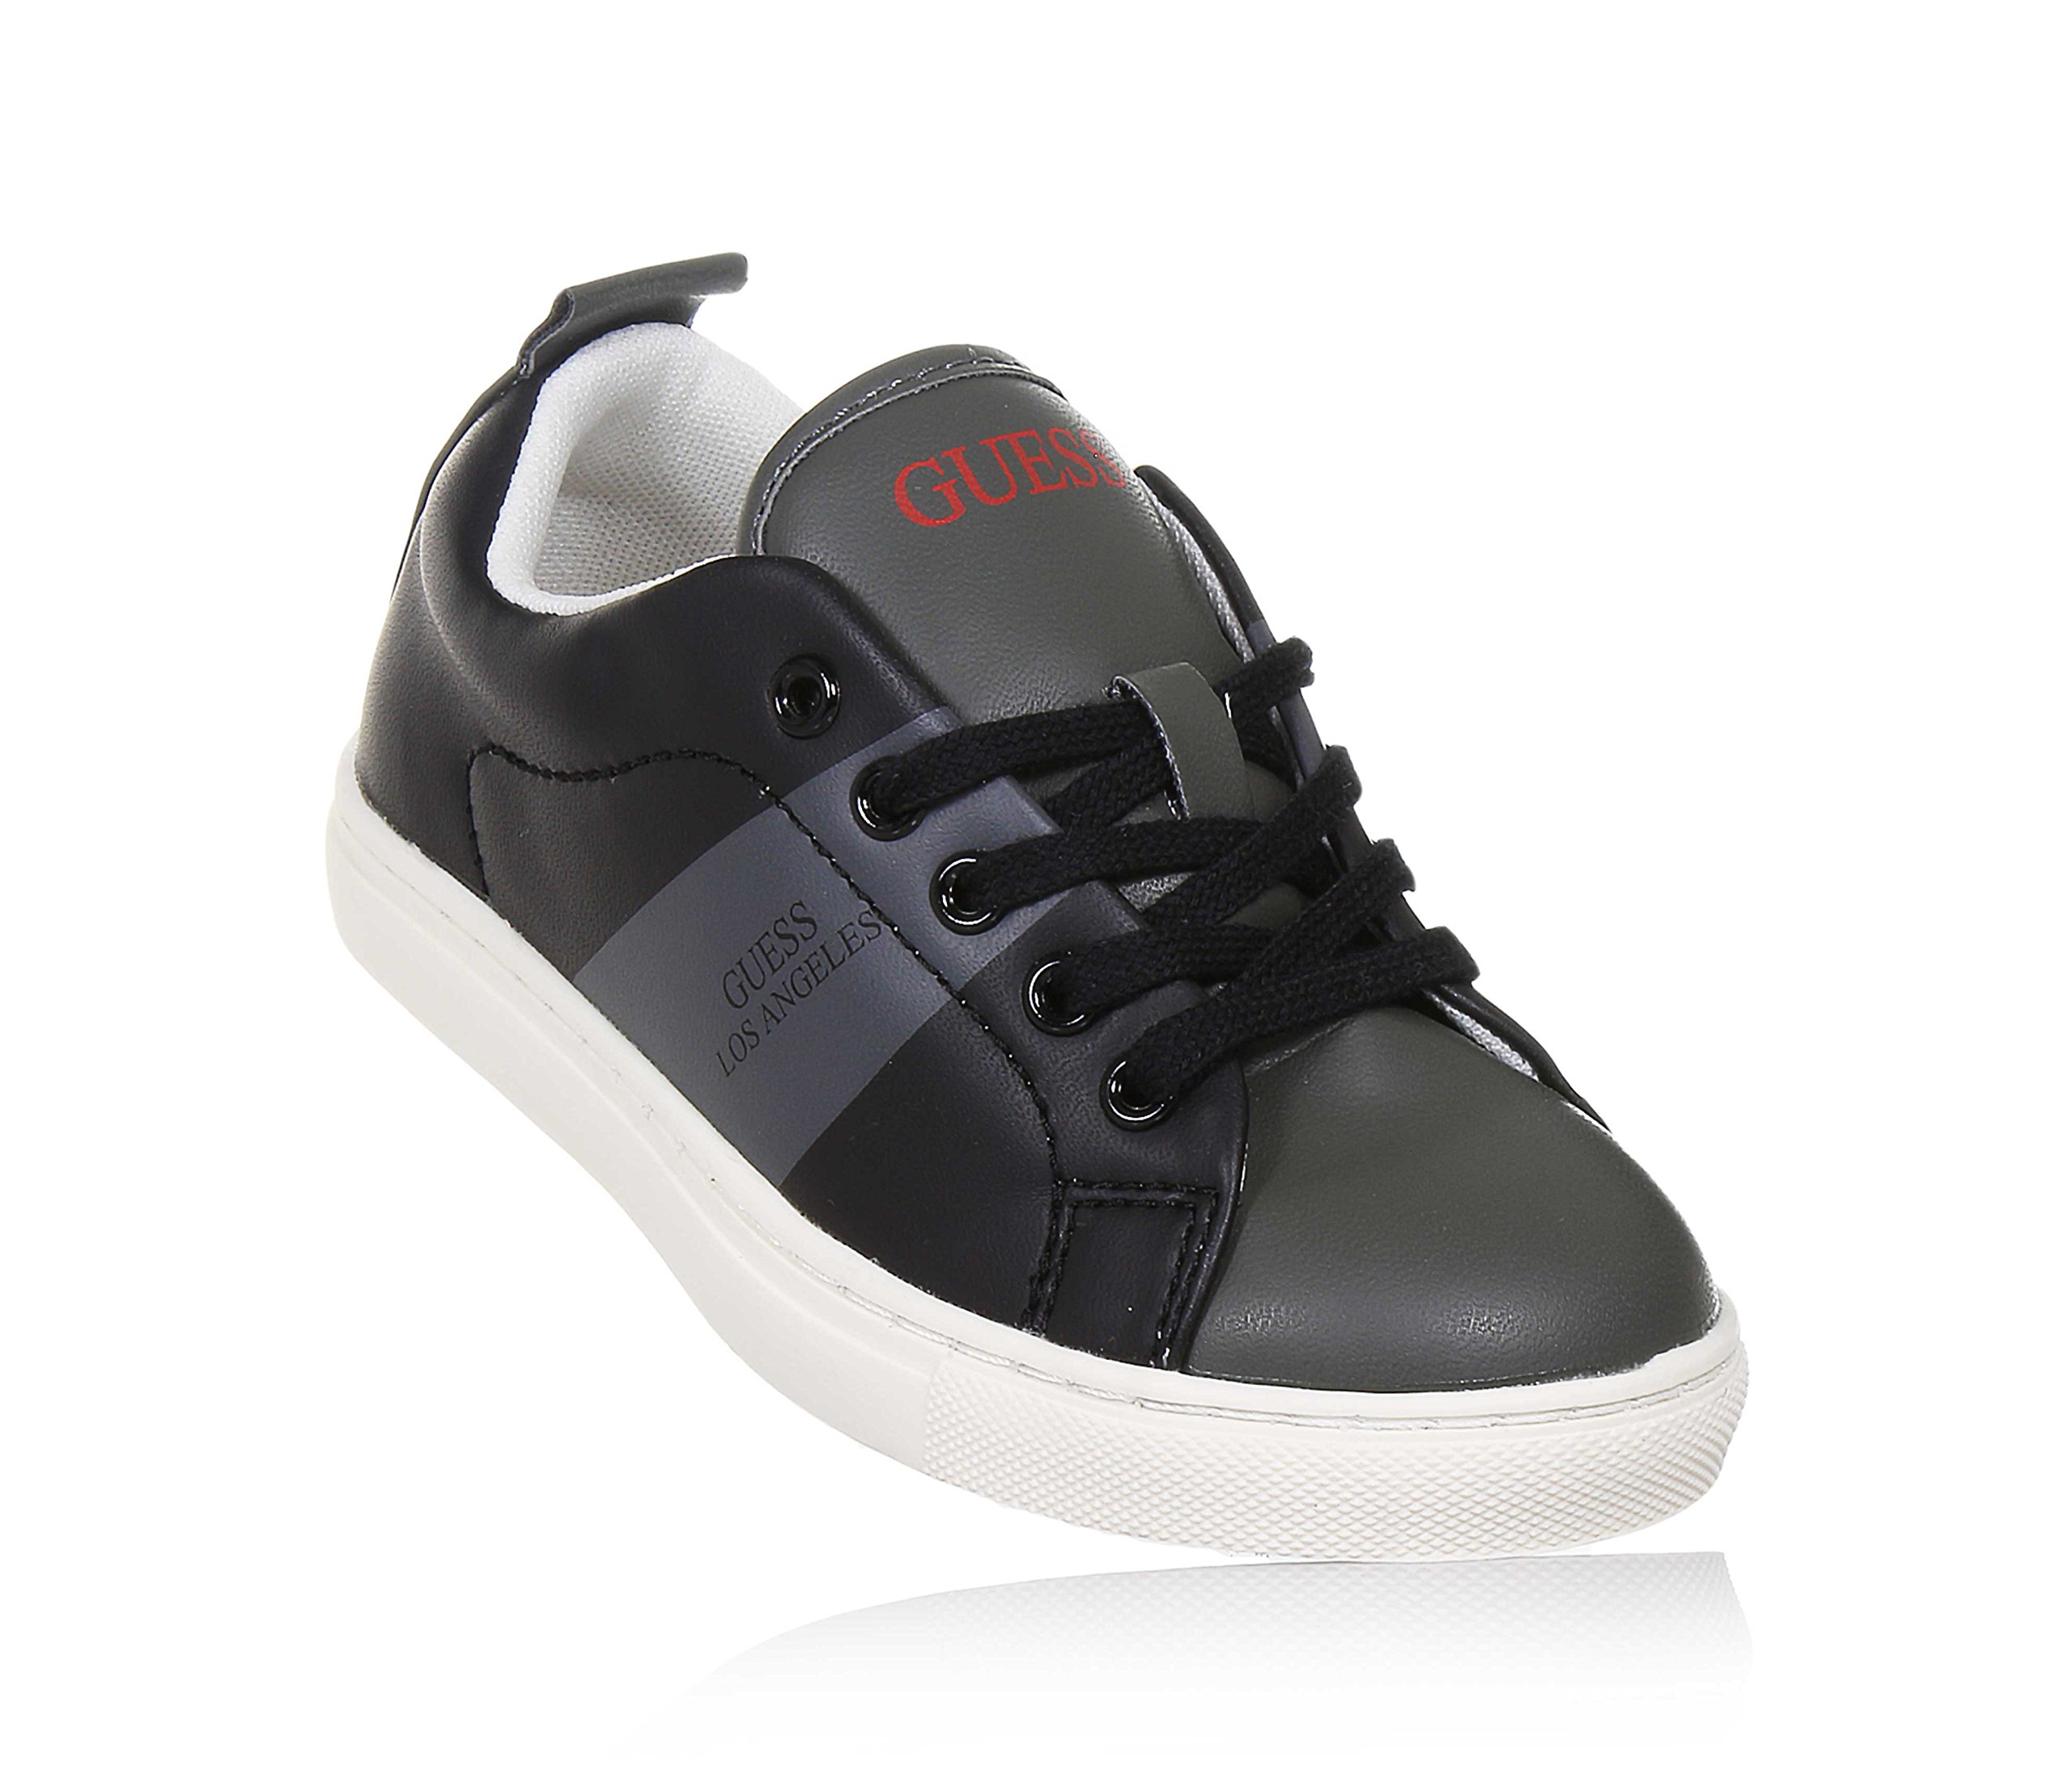 Correspondent Peer nickel  Guess Boy Shoes FISAO3 ELE12- Buy Online in Gibraltar at Desertcart